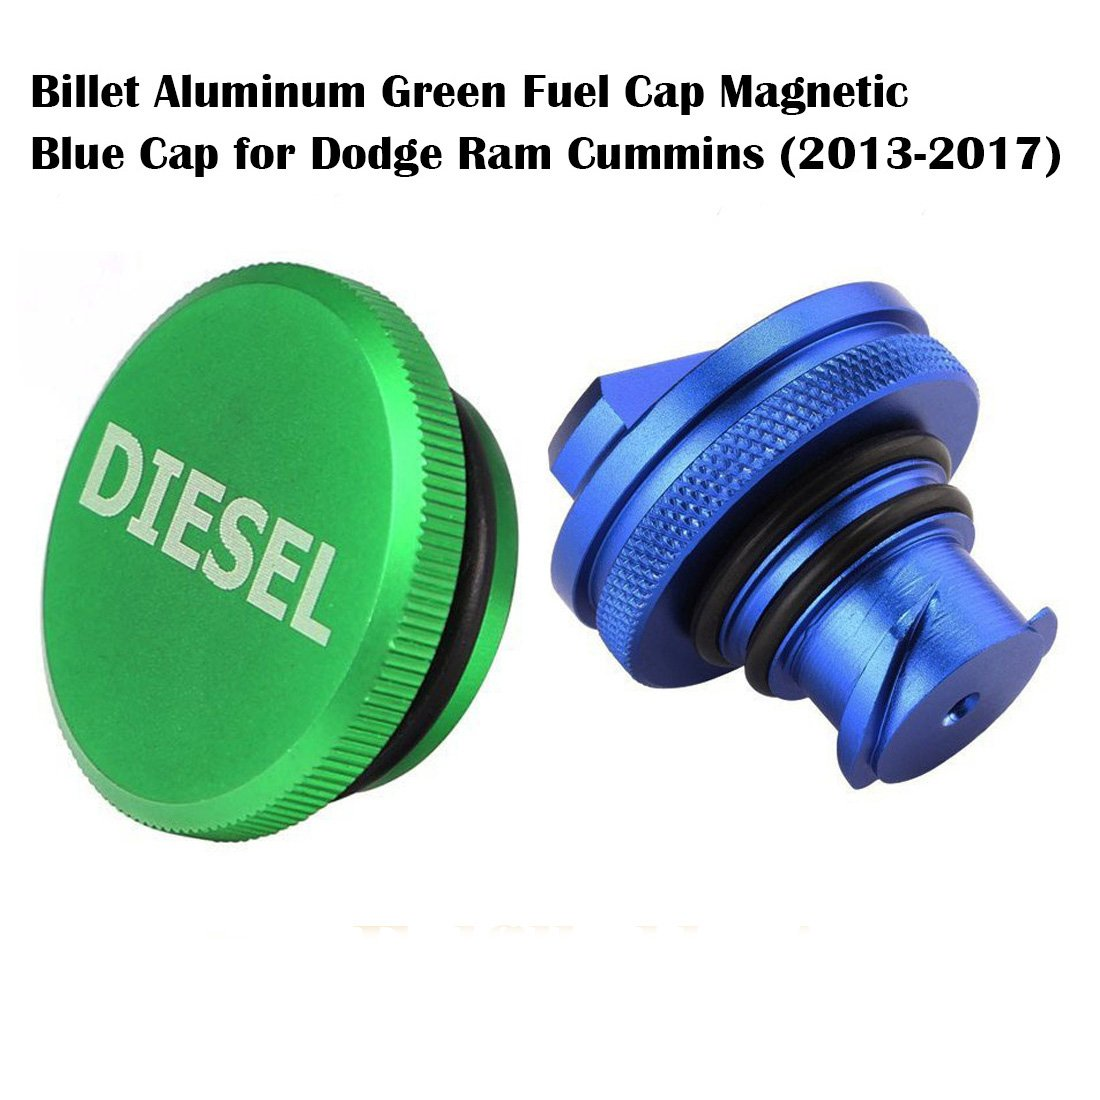 2013-2017 Dodge Ram Diesel Magnetic Billet Aluminum Fuel Cap and Blue Cap Combo by WHDZ